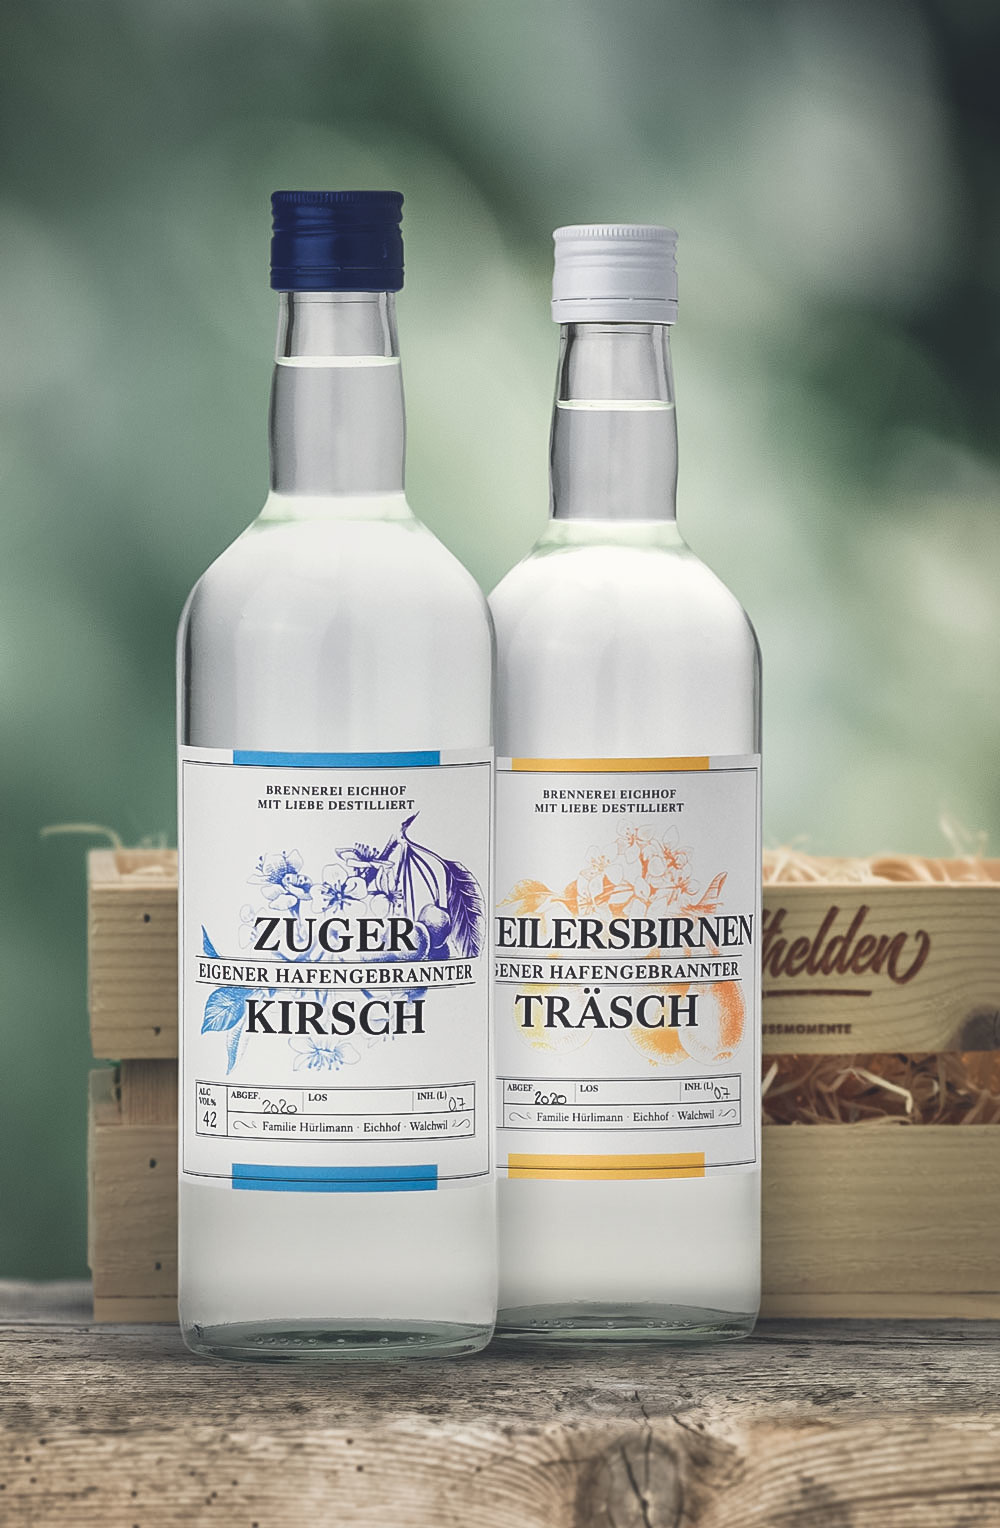 Zuger Kirsch & Theilersbirnen Träsch 70cl in Harasse-2